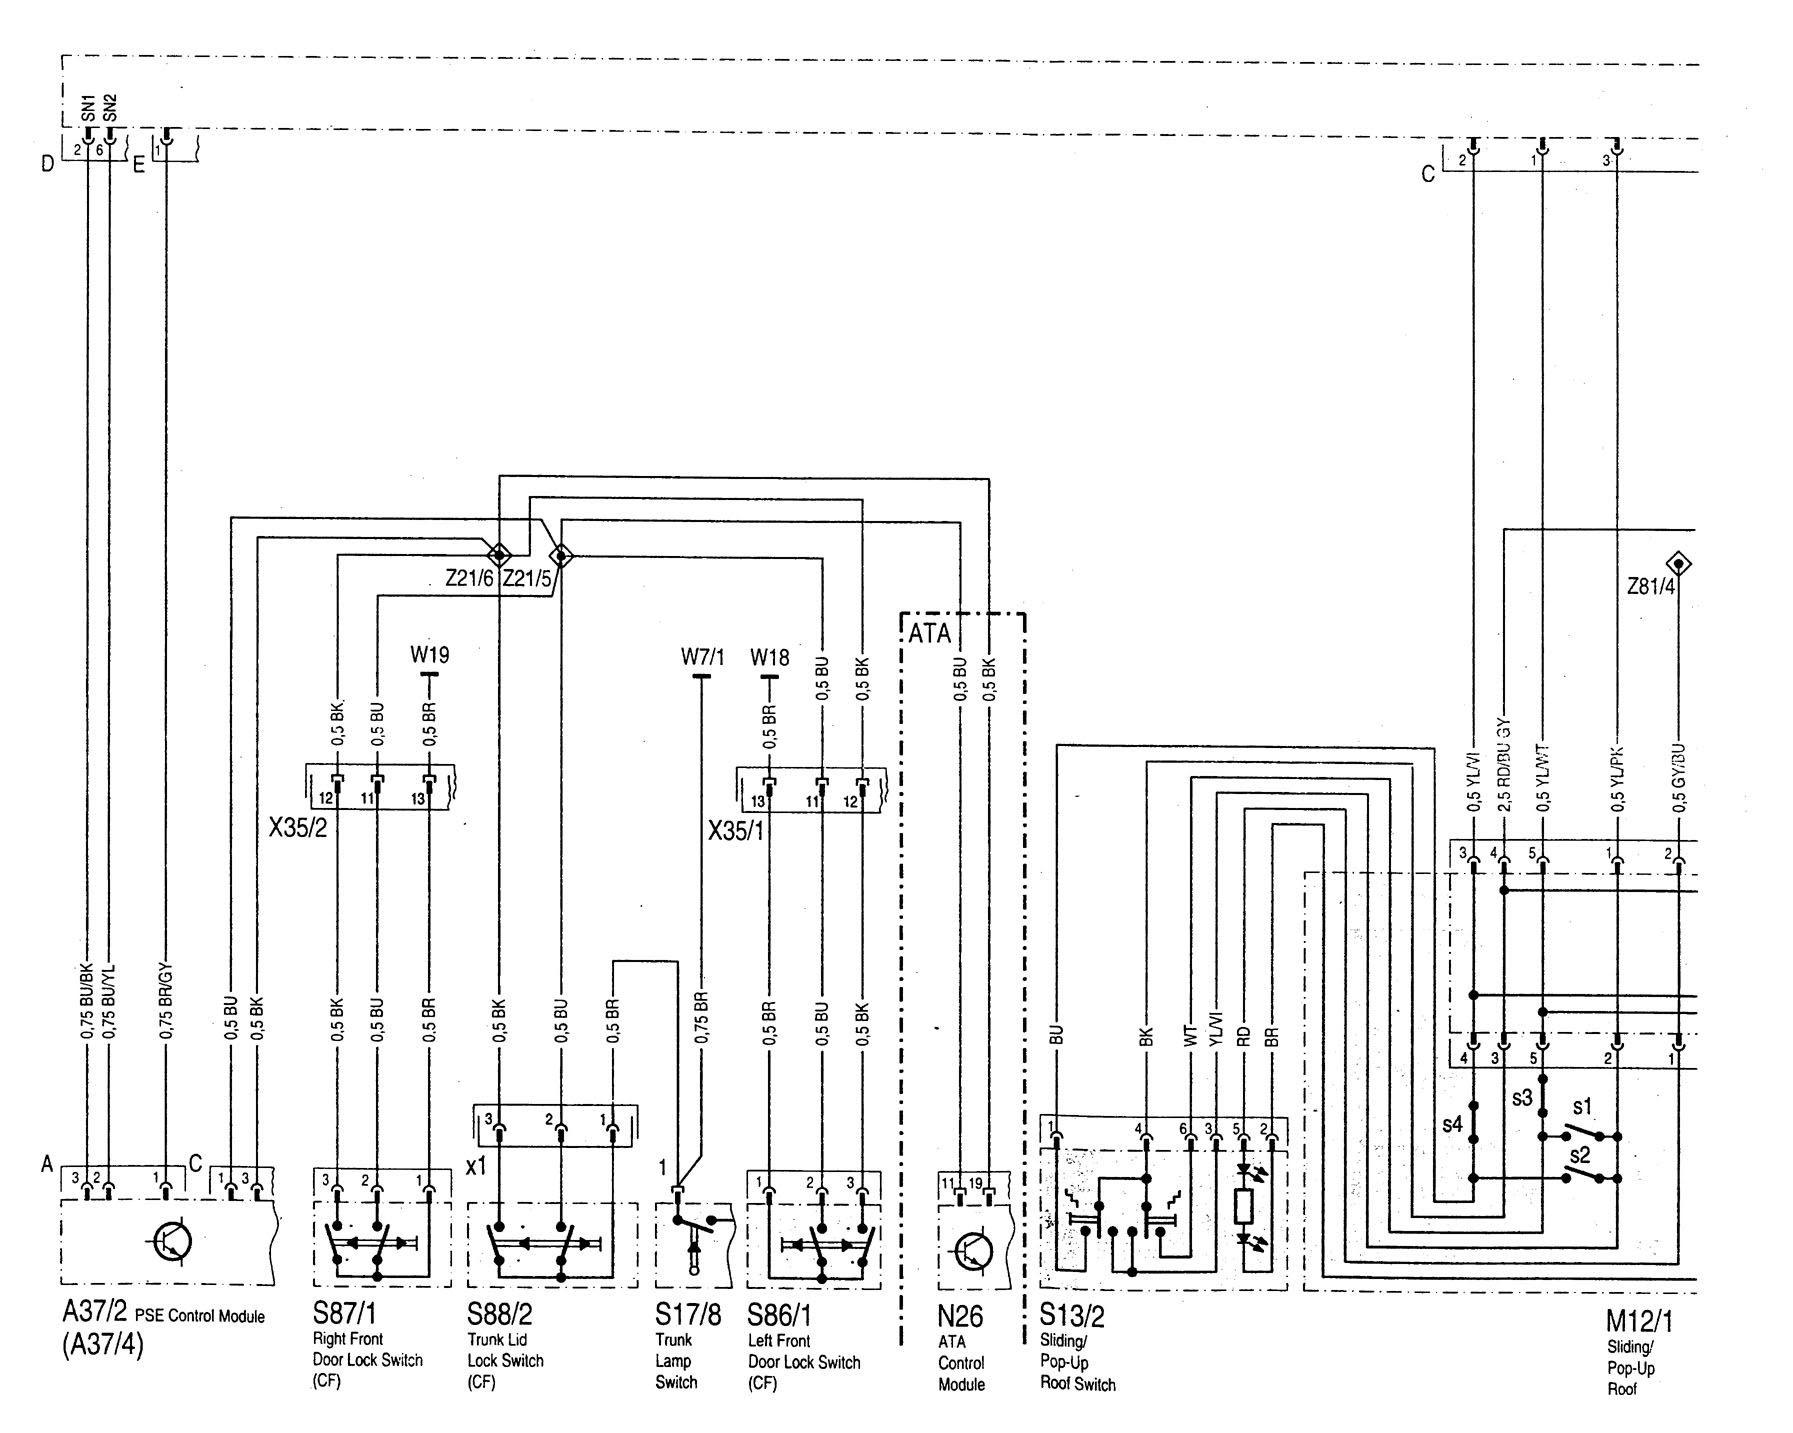 Kubota B7800 Wiring Diagram from lh5.googleusercontent.com